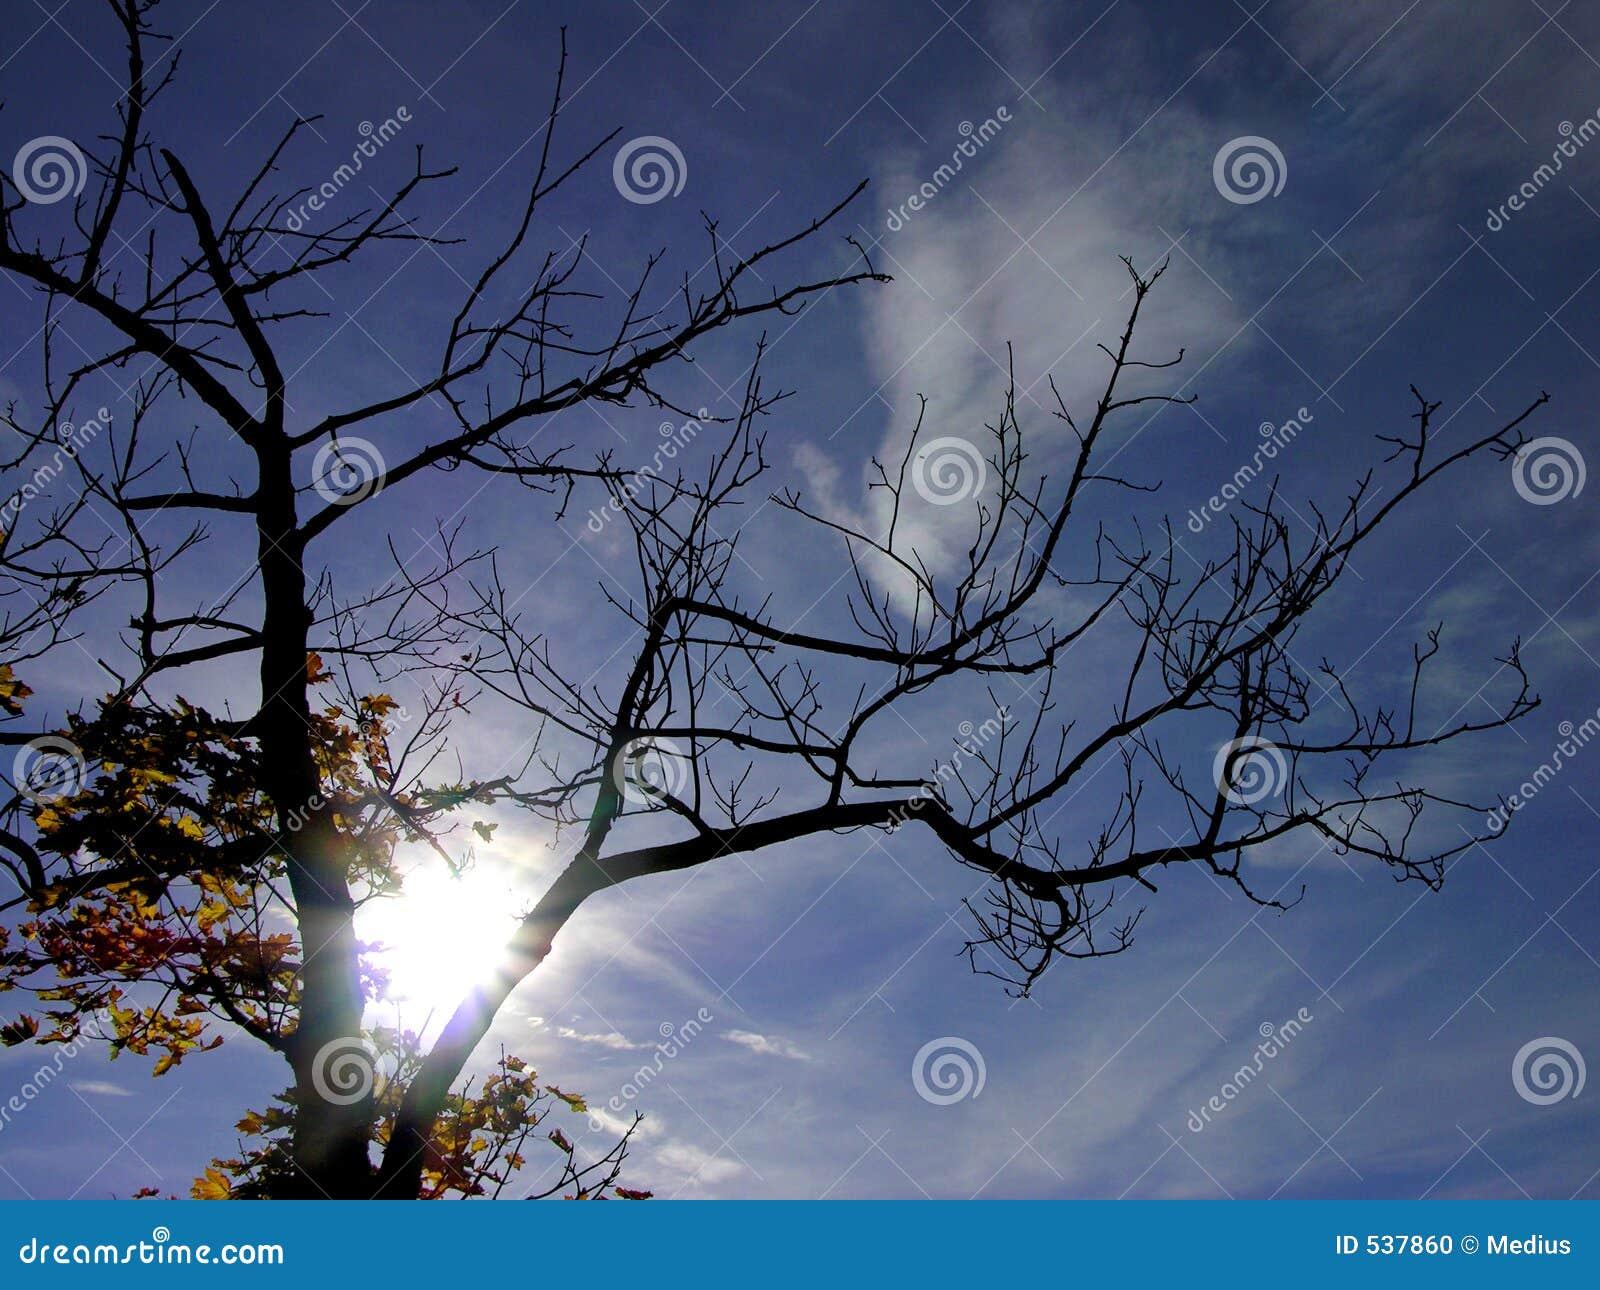 Download 秋天蓝天星期日顶层结构树 库存照片. 图片 包括有 介绍, 纹理, 透视图, 季节, 结算, 蓝色, 欢悦, 装饰 - 537860